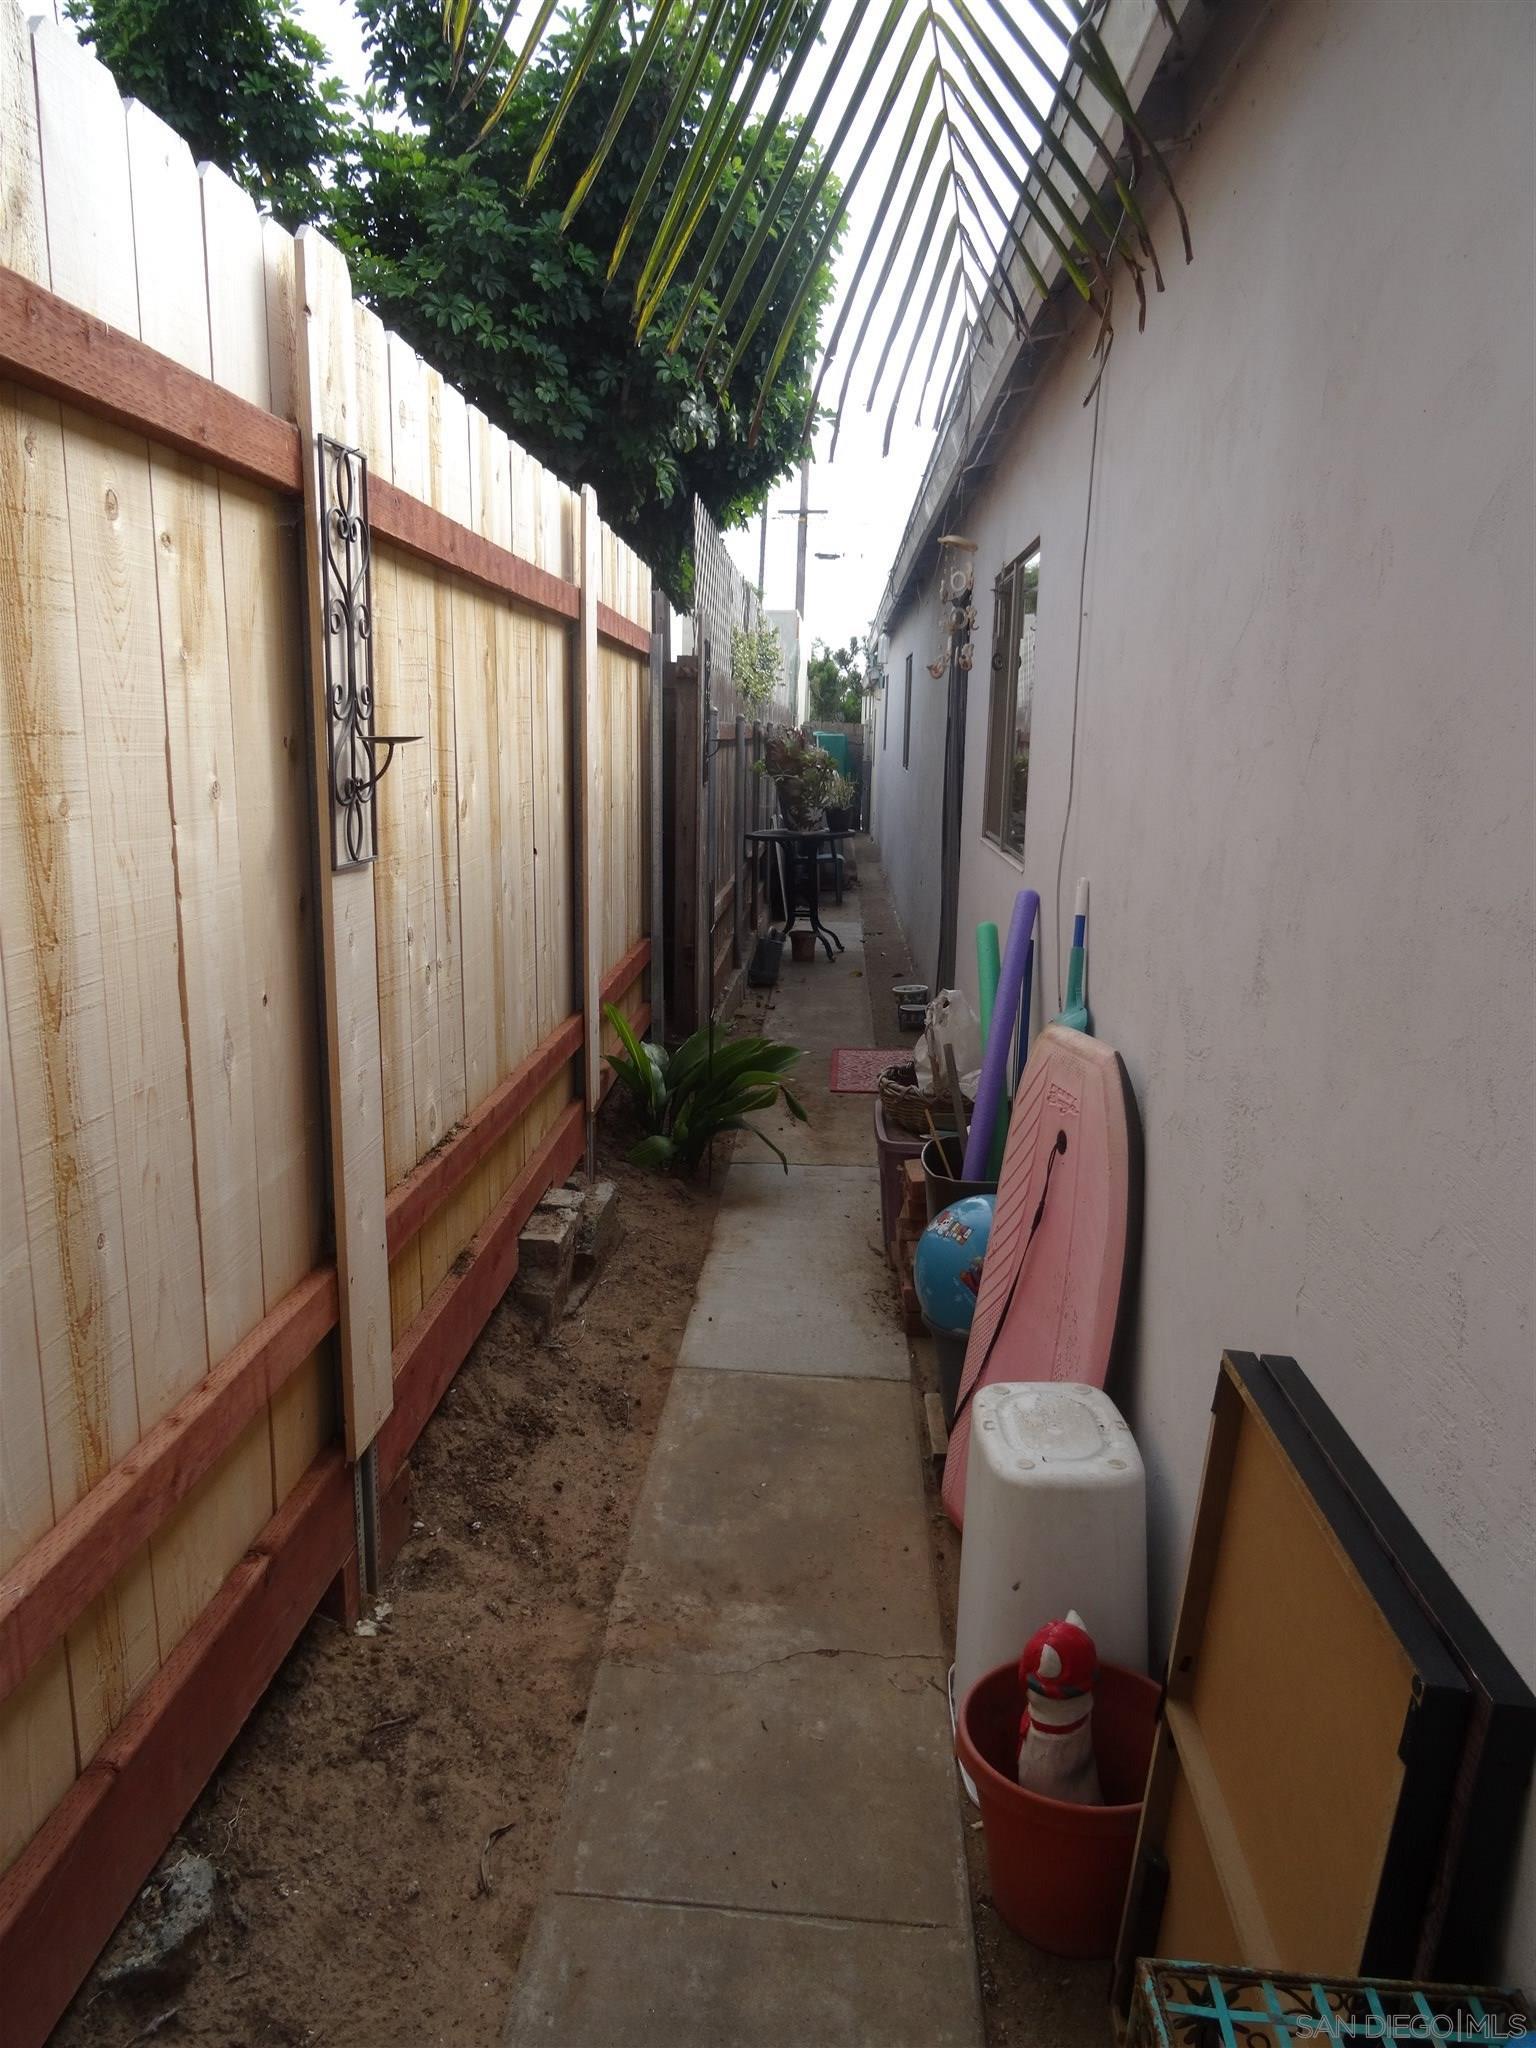 975 Archer Street, San Diego CA 92109